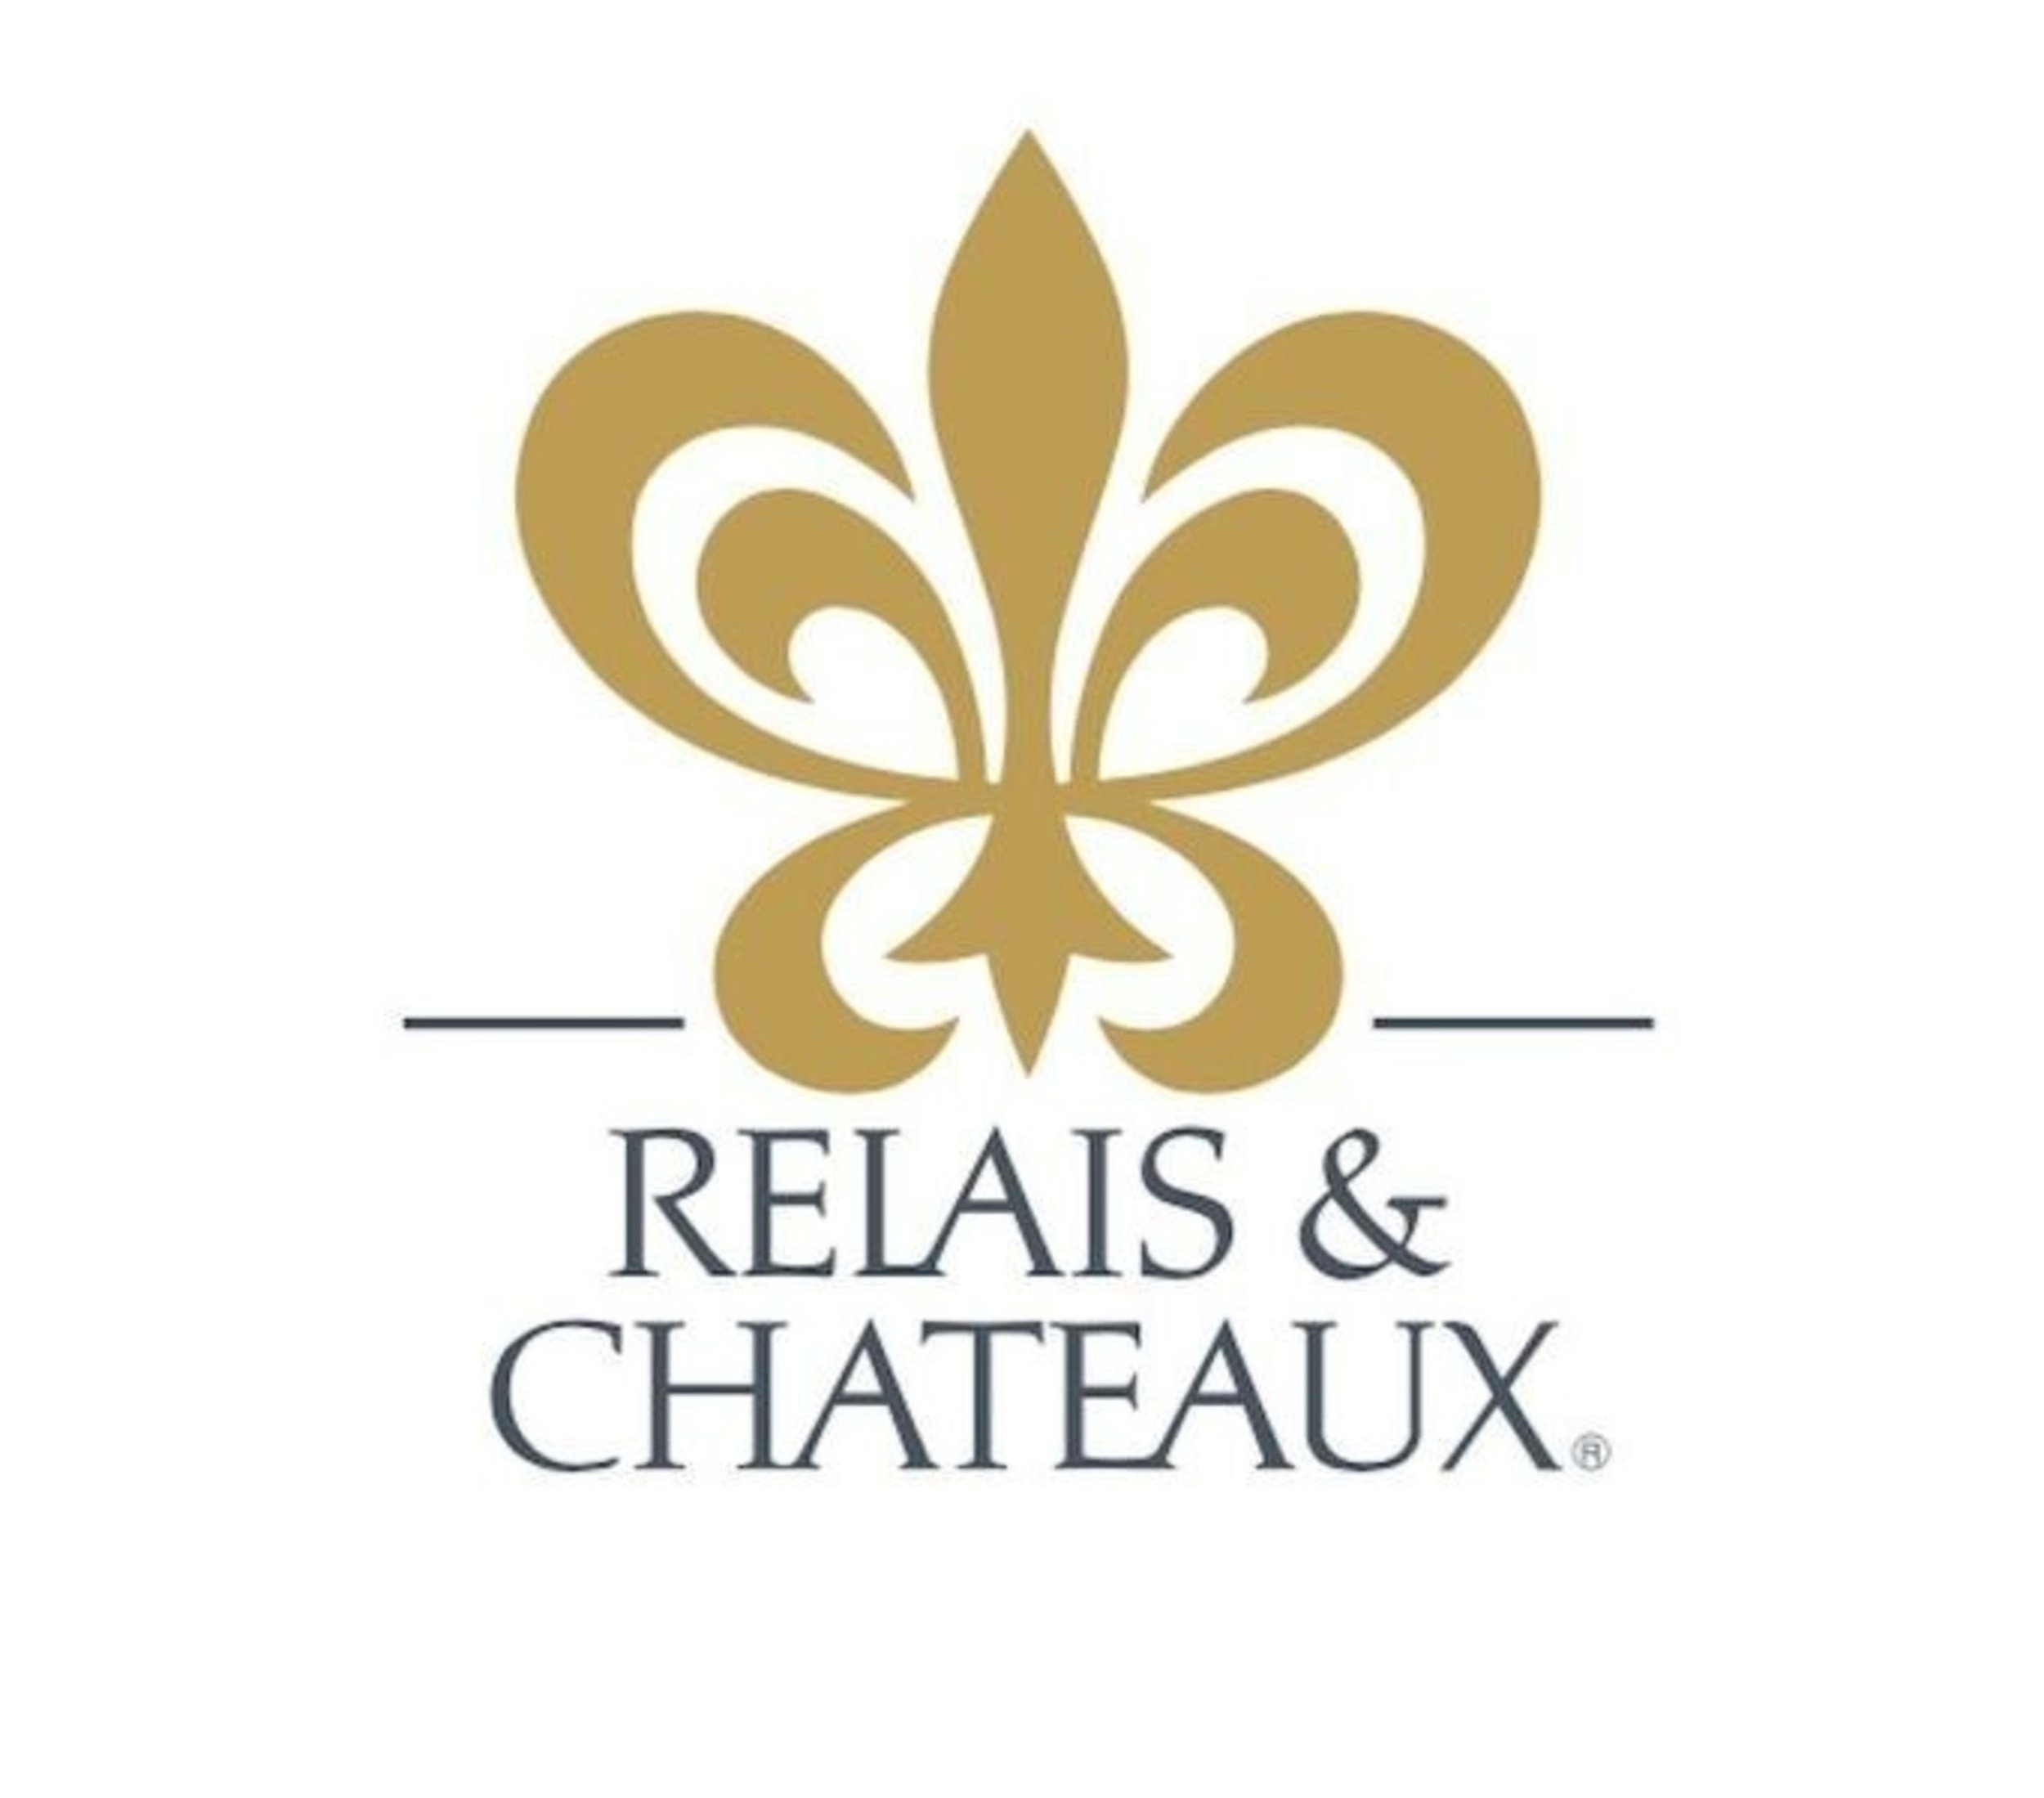 Relais & Chateaux.jpeg